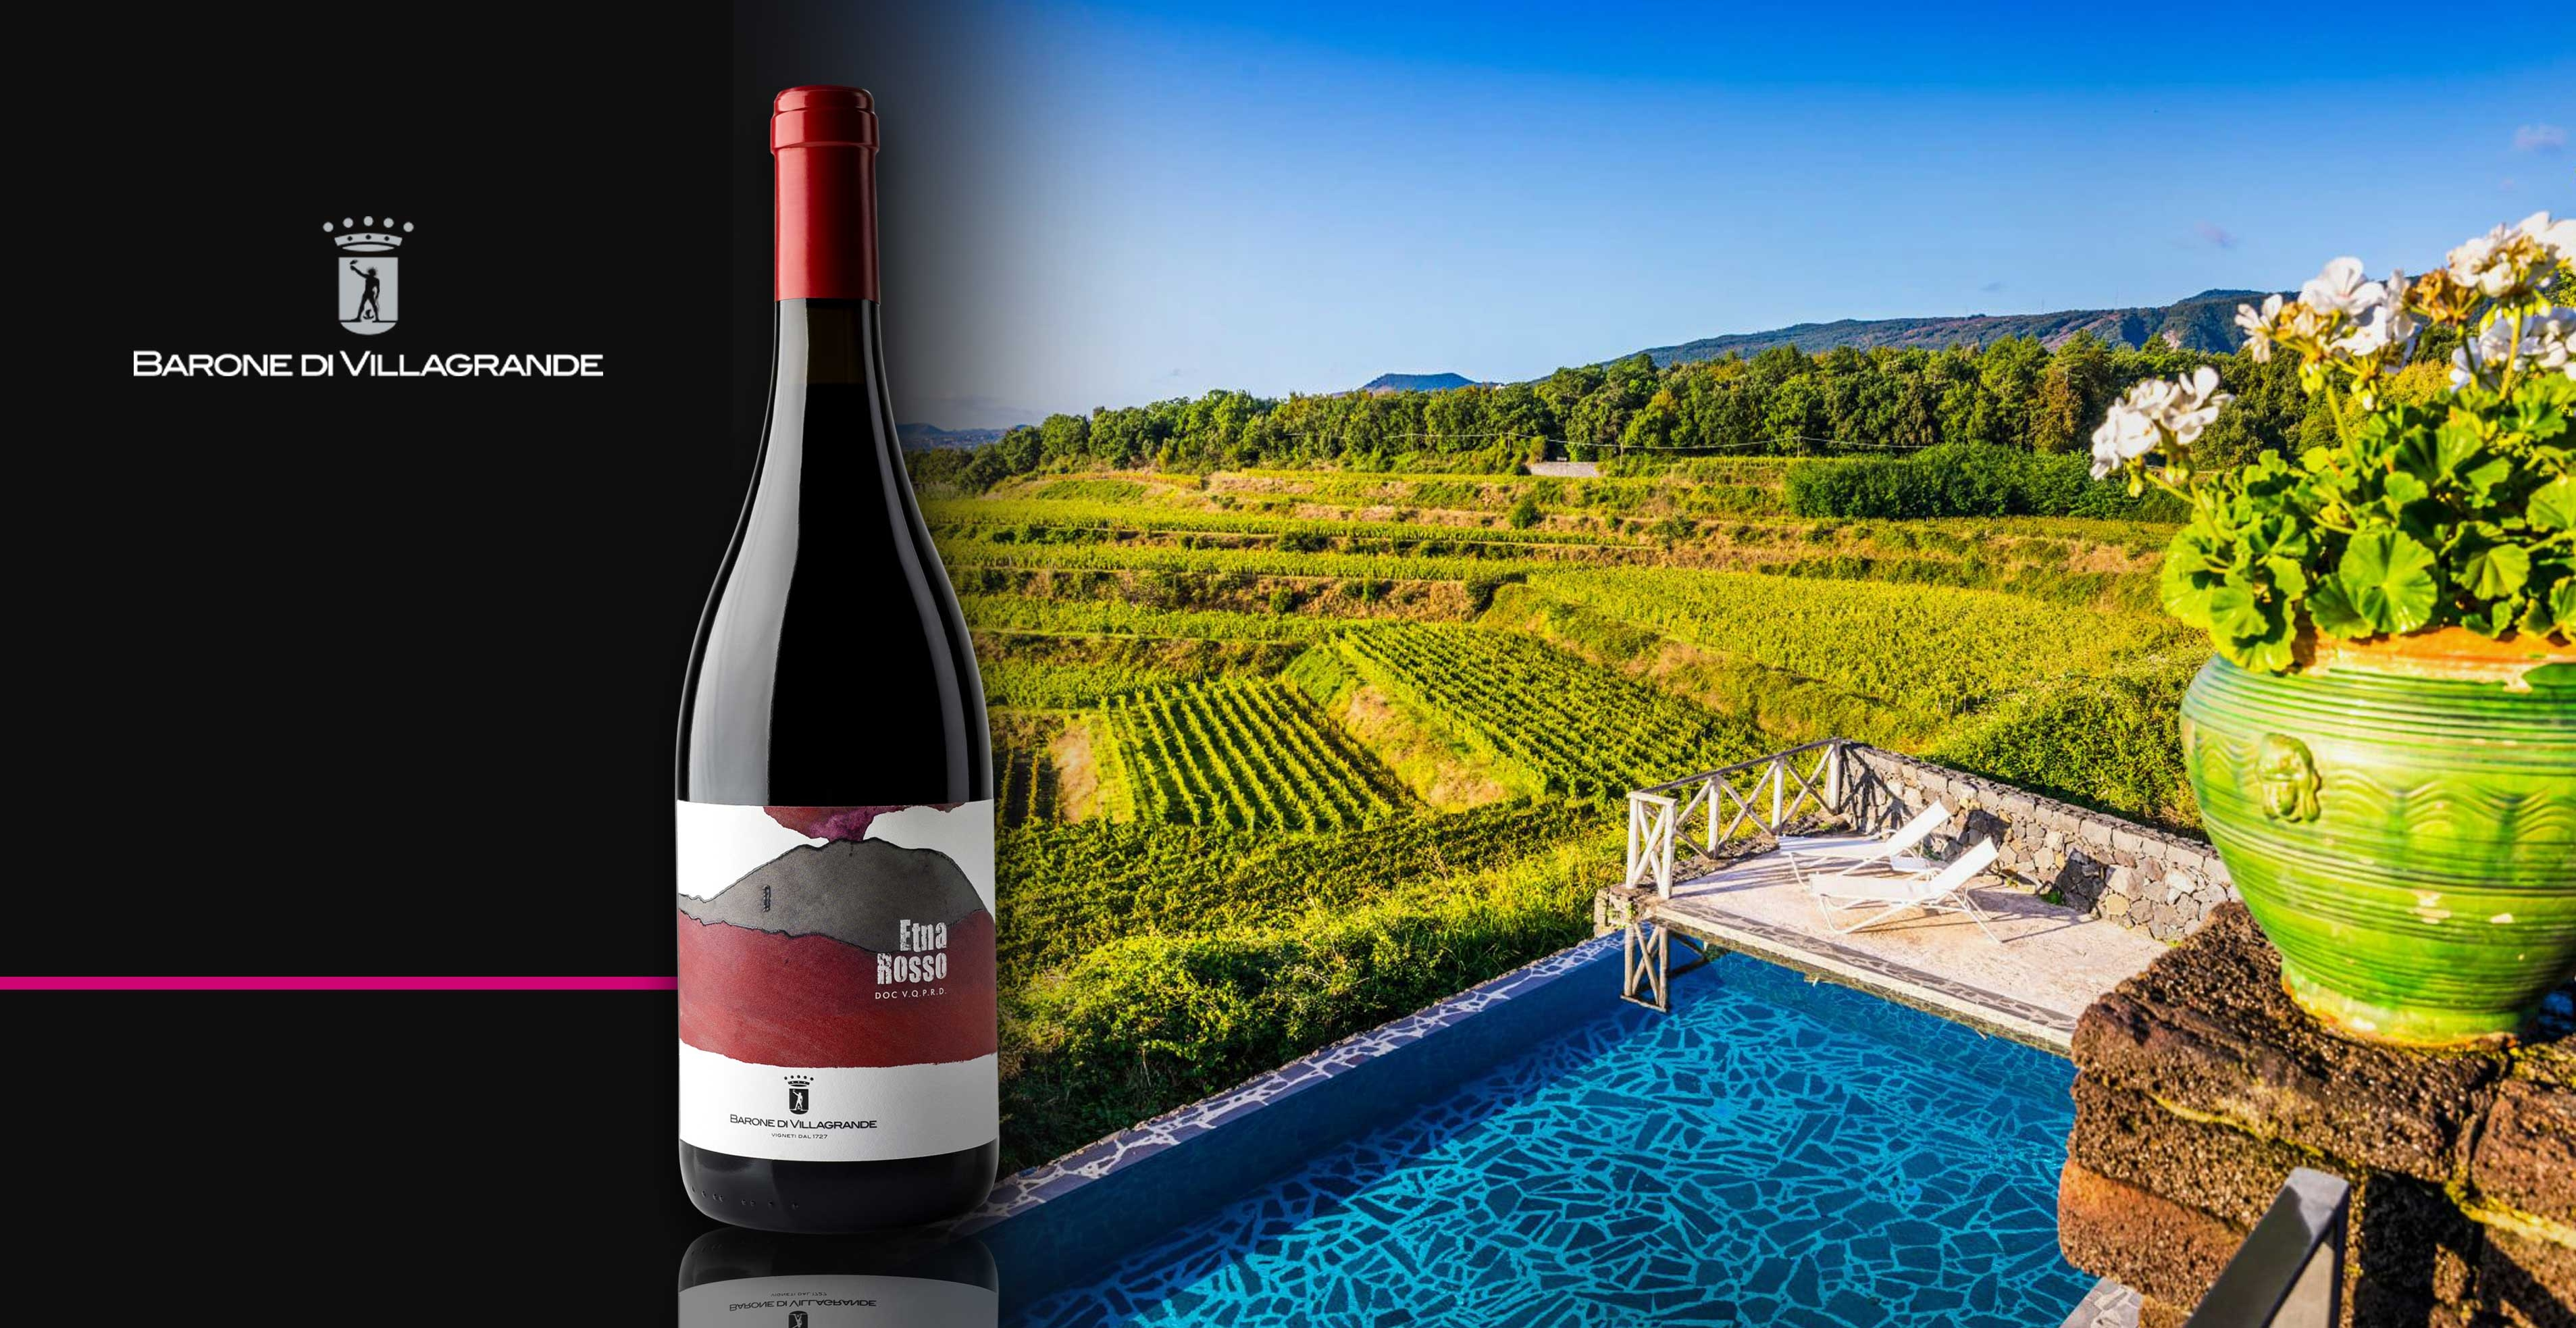 Vins Rouges Bruxelles Barone di Villagrande